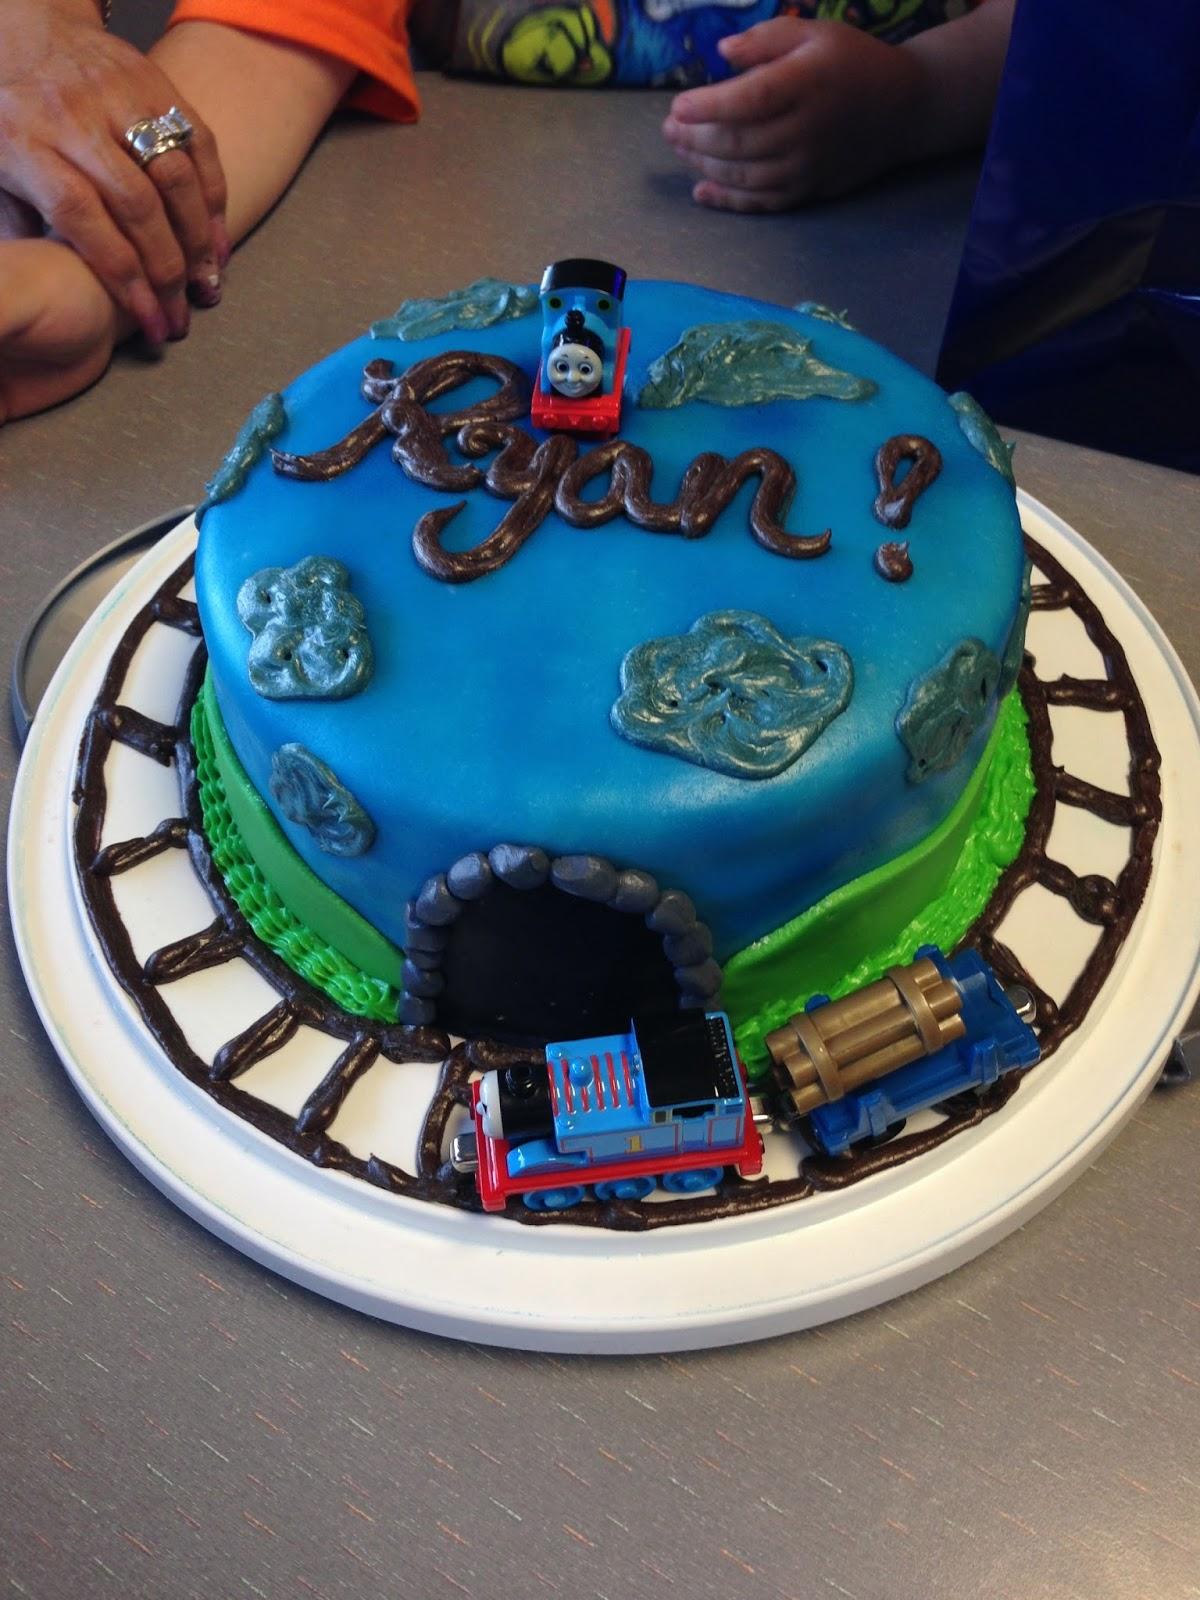 Sams Cute Cakes Thomas The Train Cake